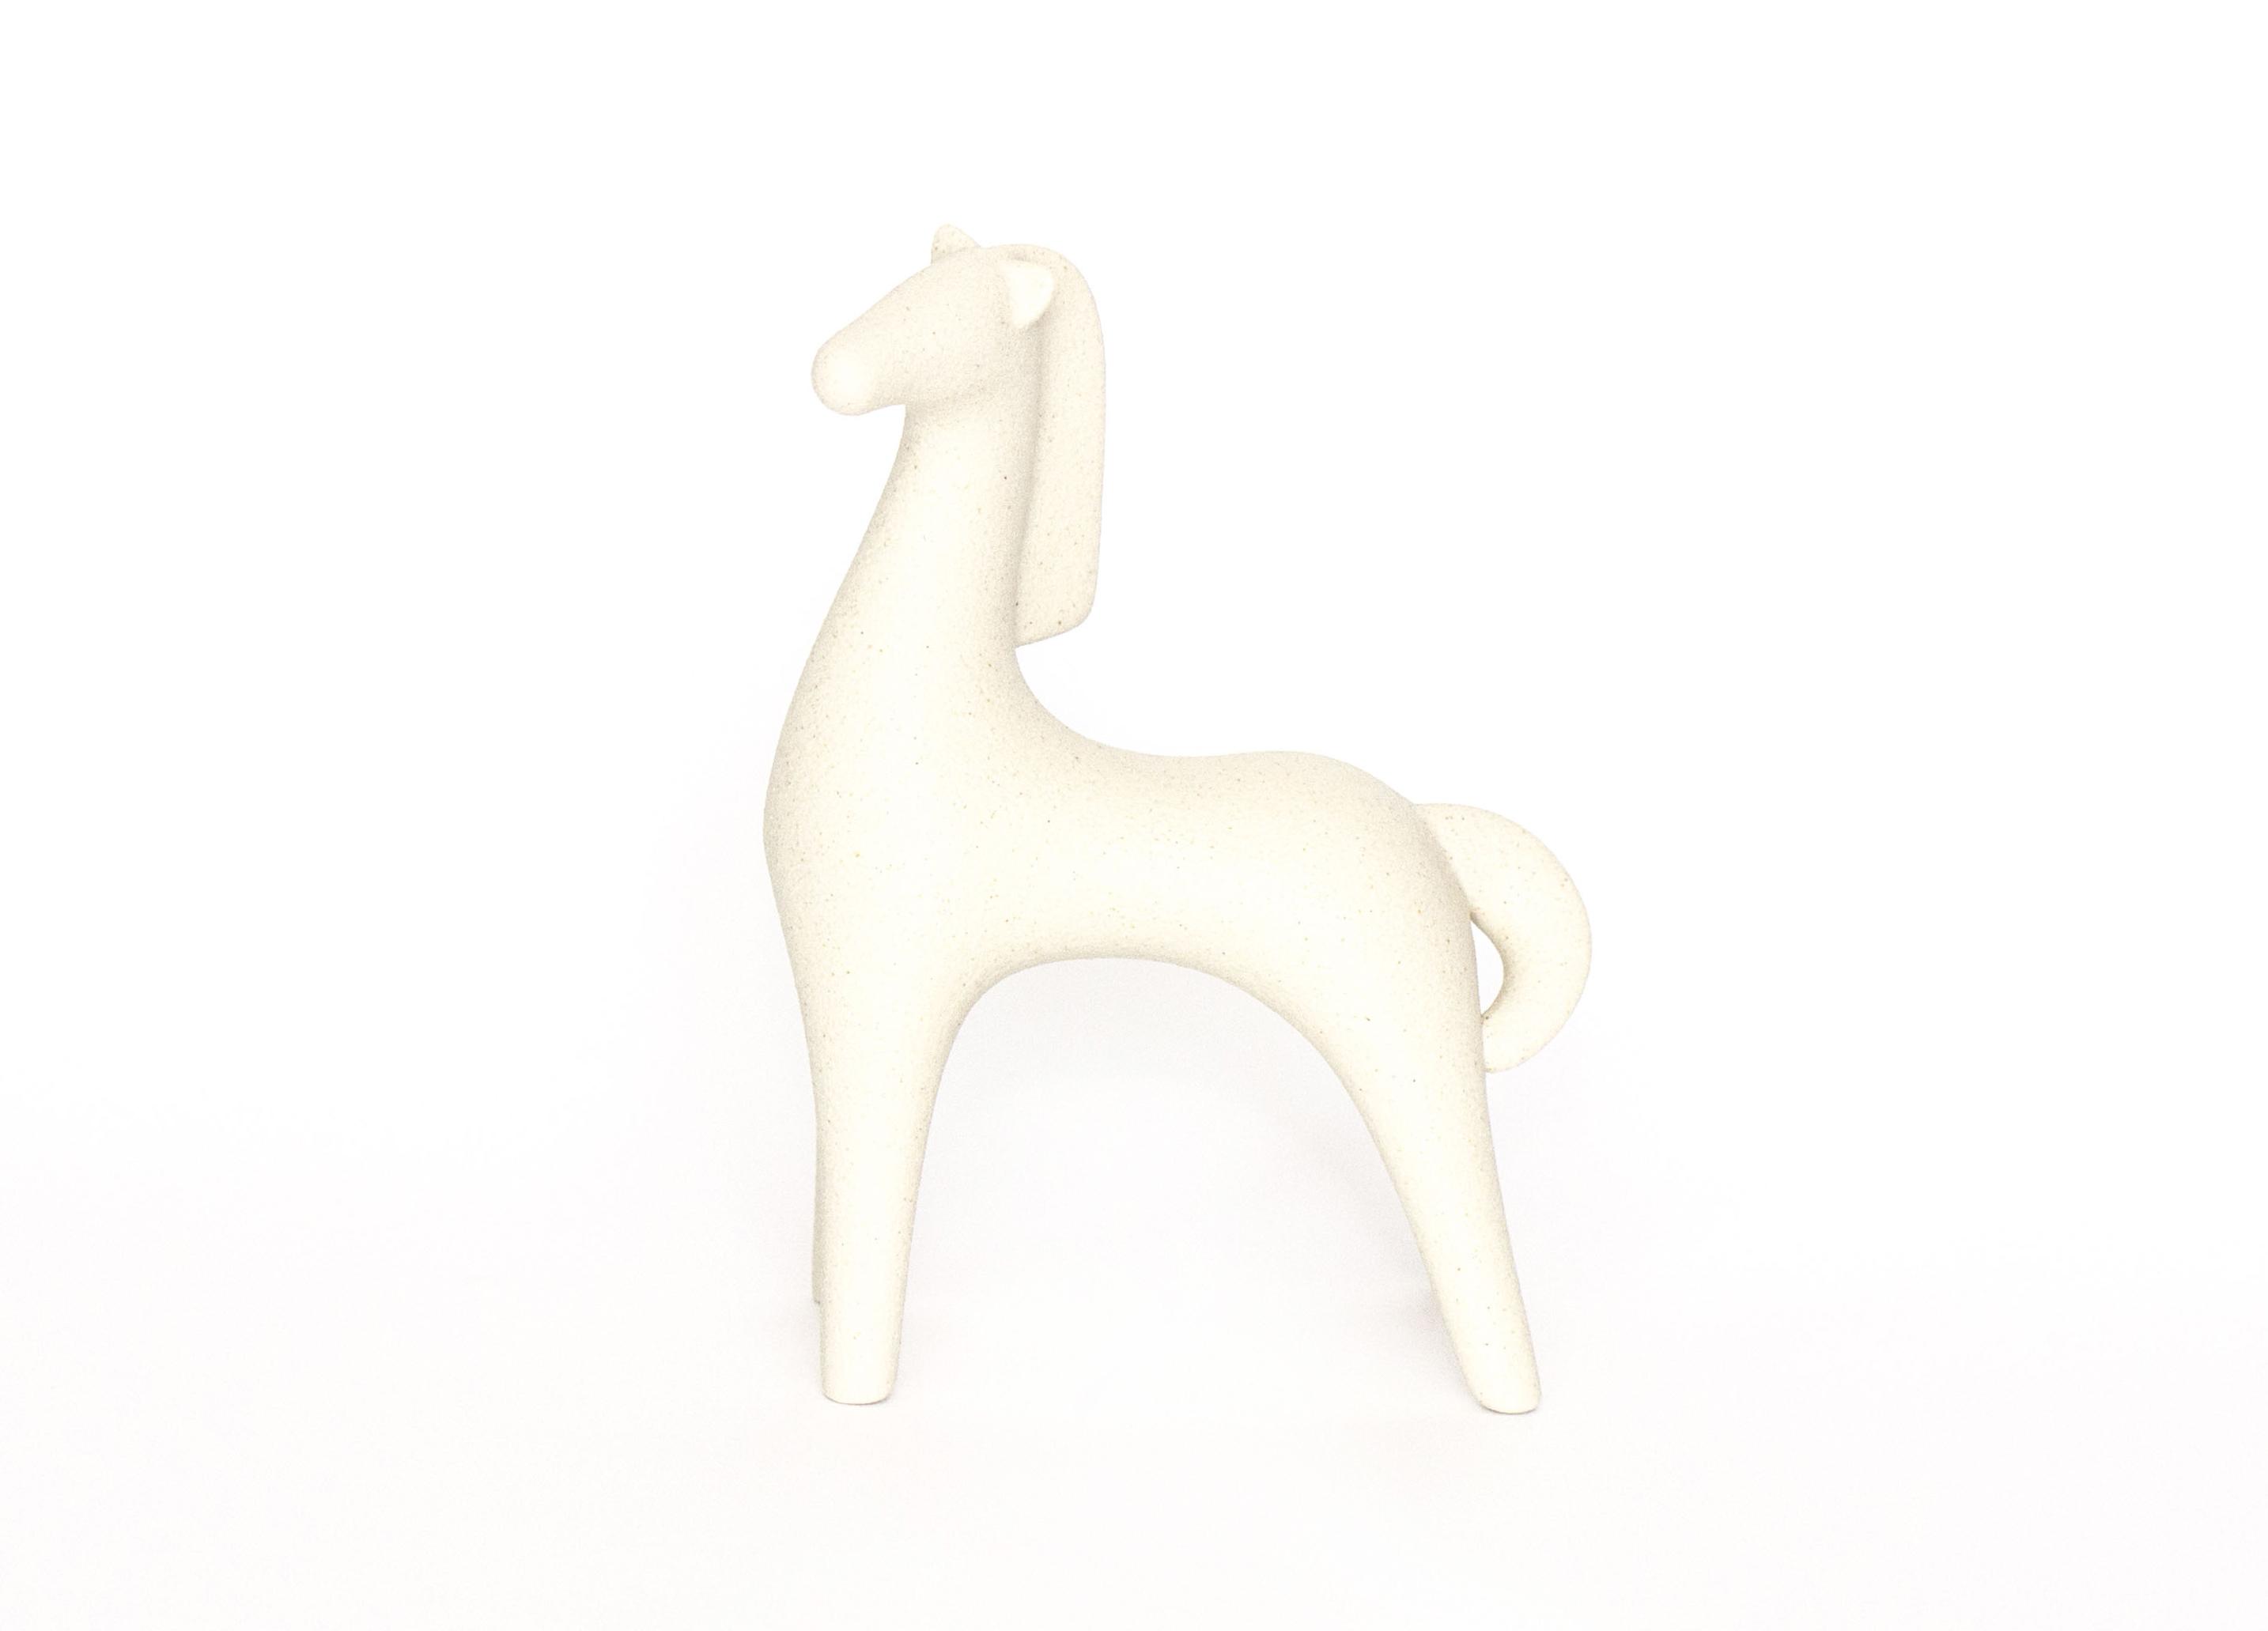 Фигура ЛошадьСтатуэтки<br><br><br>Material: Керамика<br>Length см: 12<br>Width см: 7<br>Height см: 17